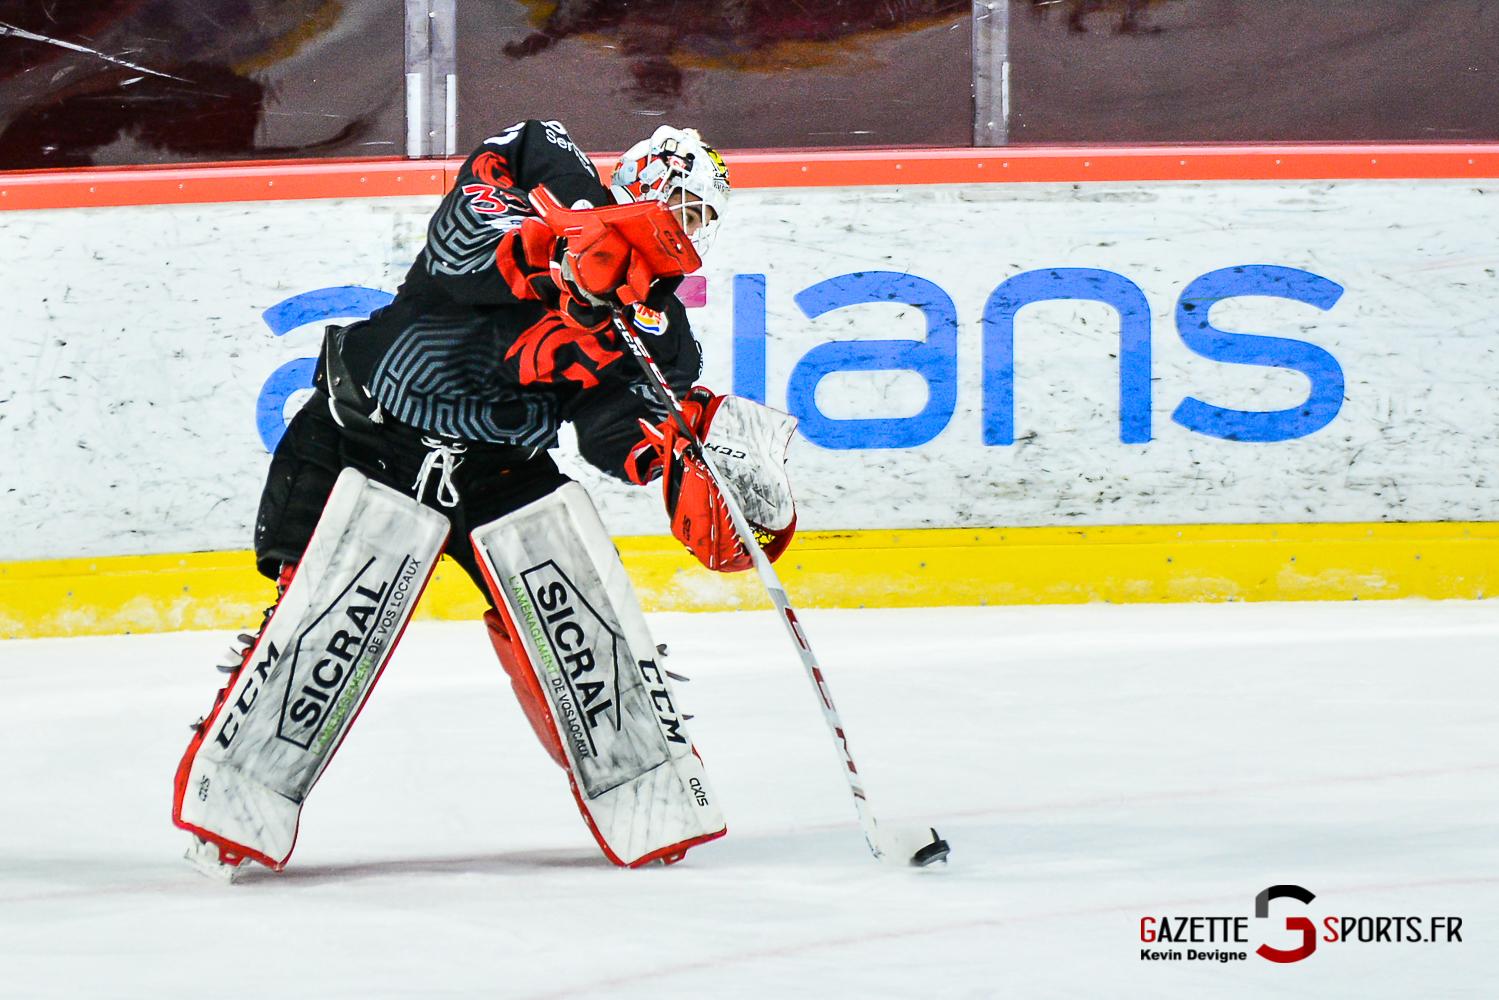 Hockey Sur Glace Amiens Vs Anglet 21 Kevin Devigne Gazettesports 59